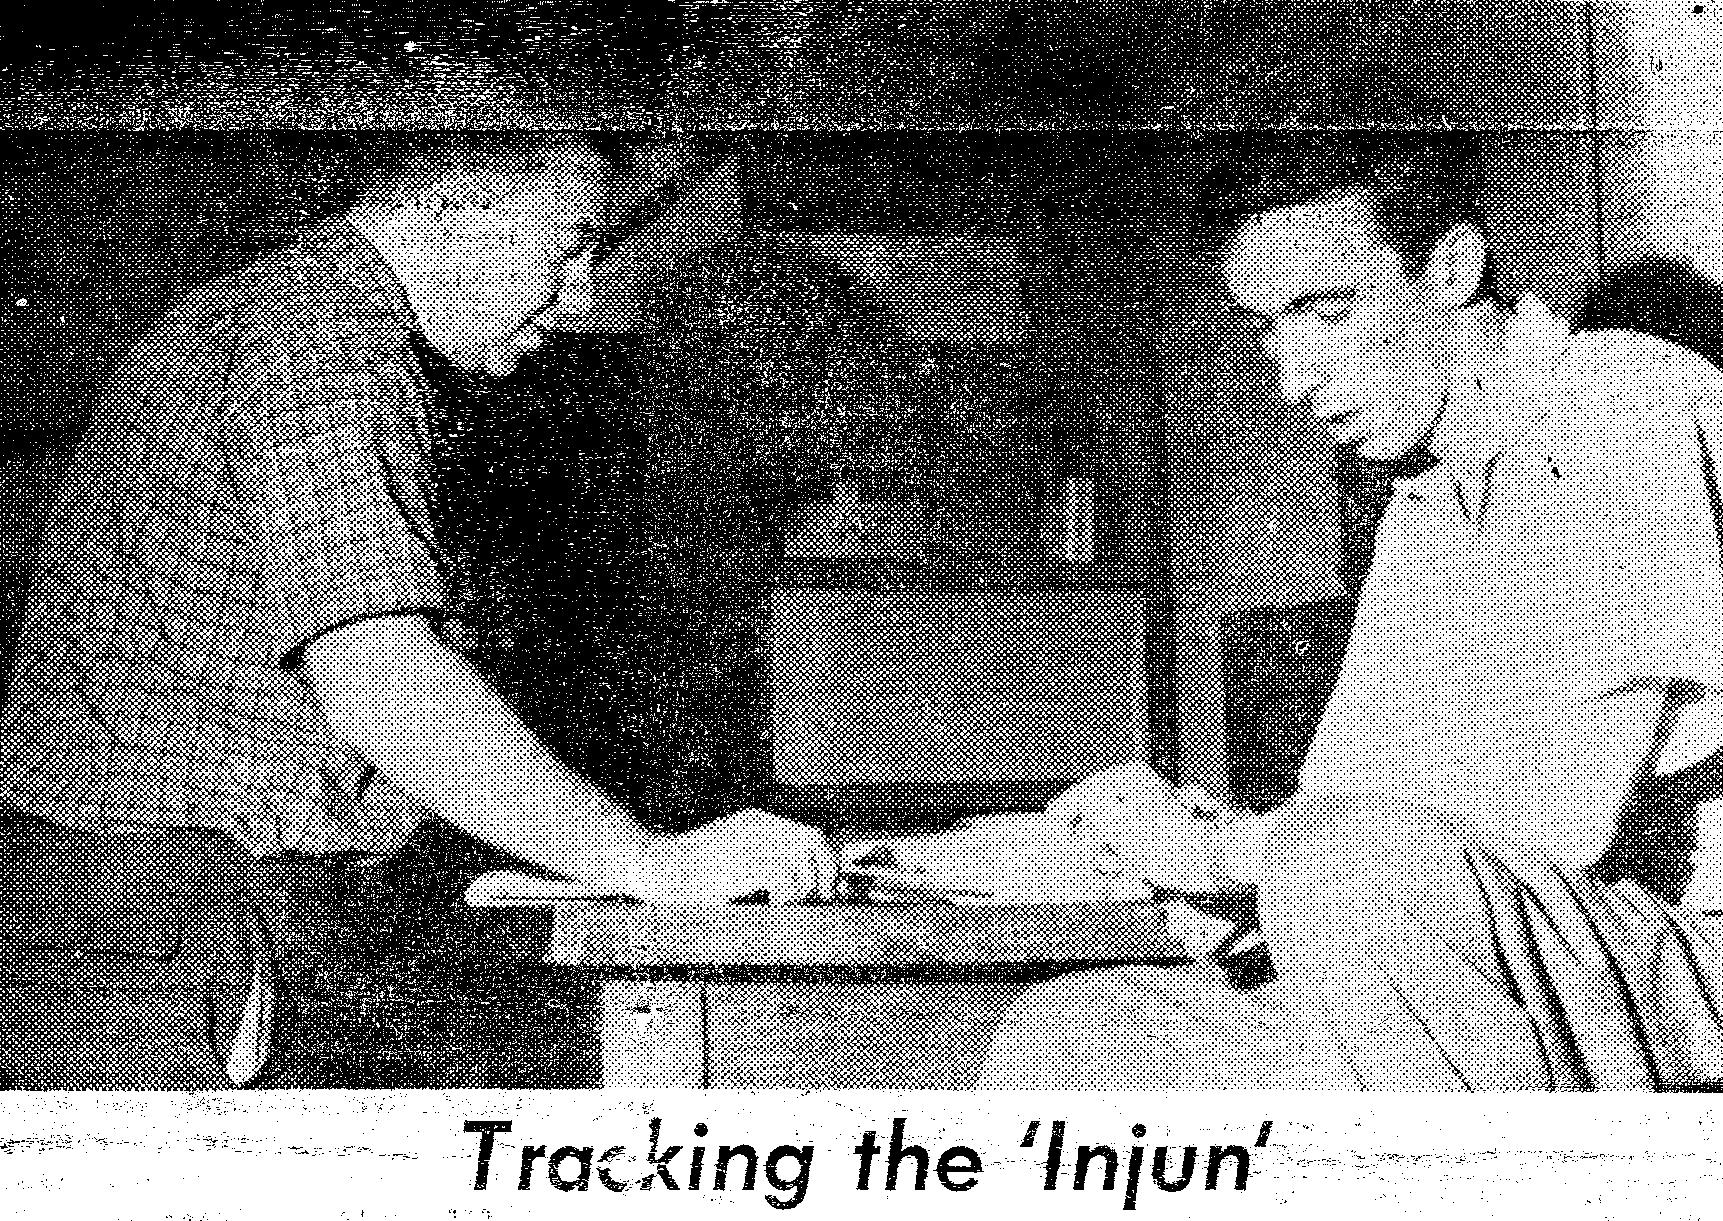 Brian J. O'Brien and James van Allen tracking the Injun 1 satellite.